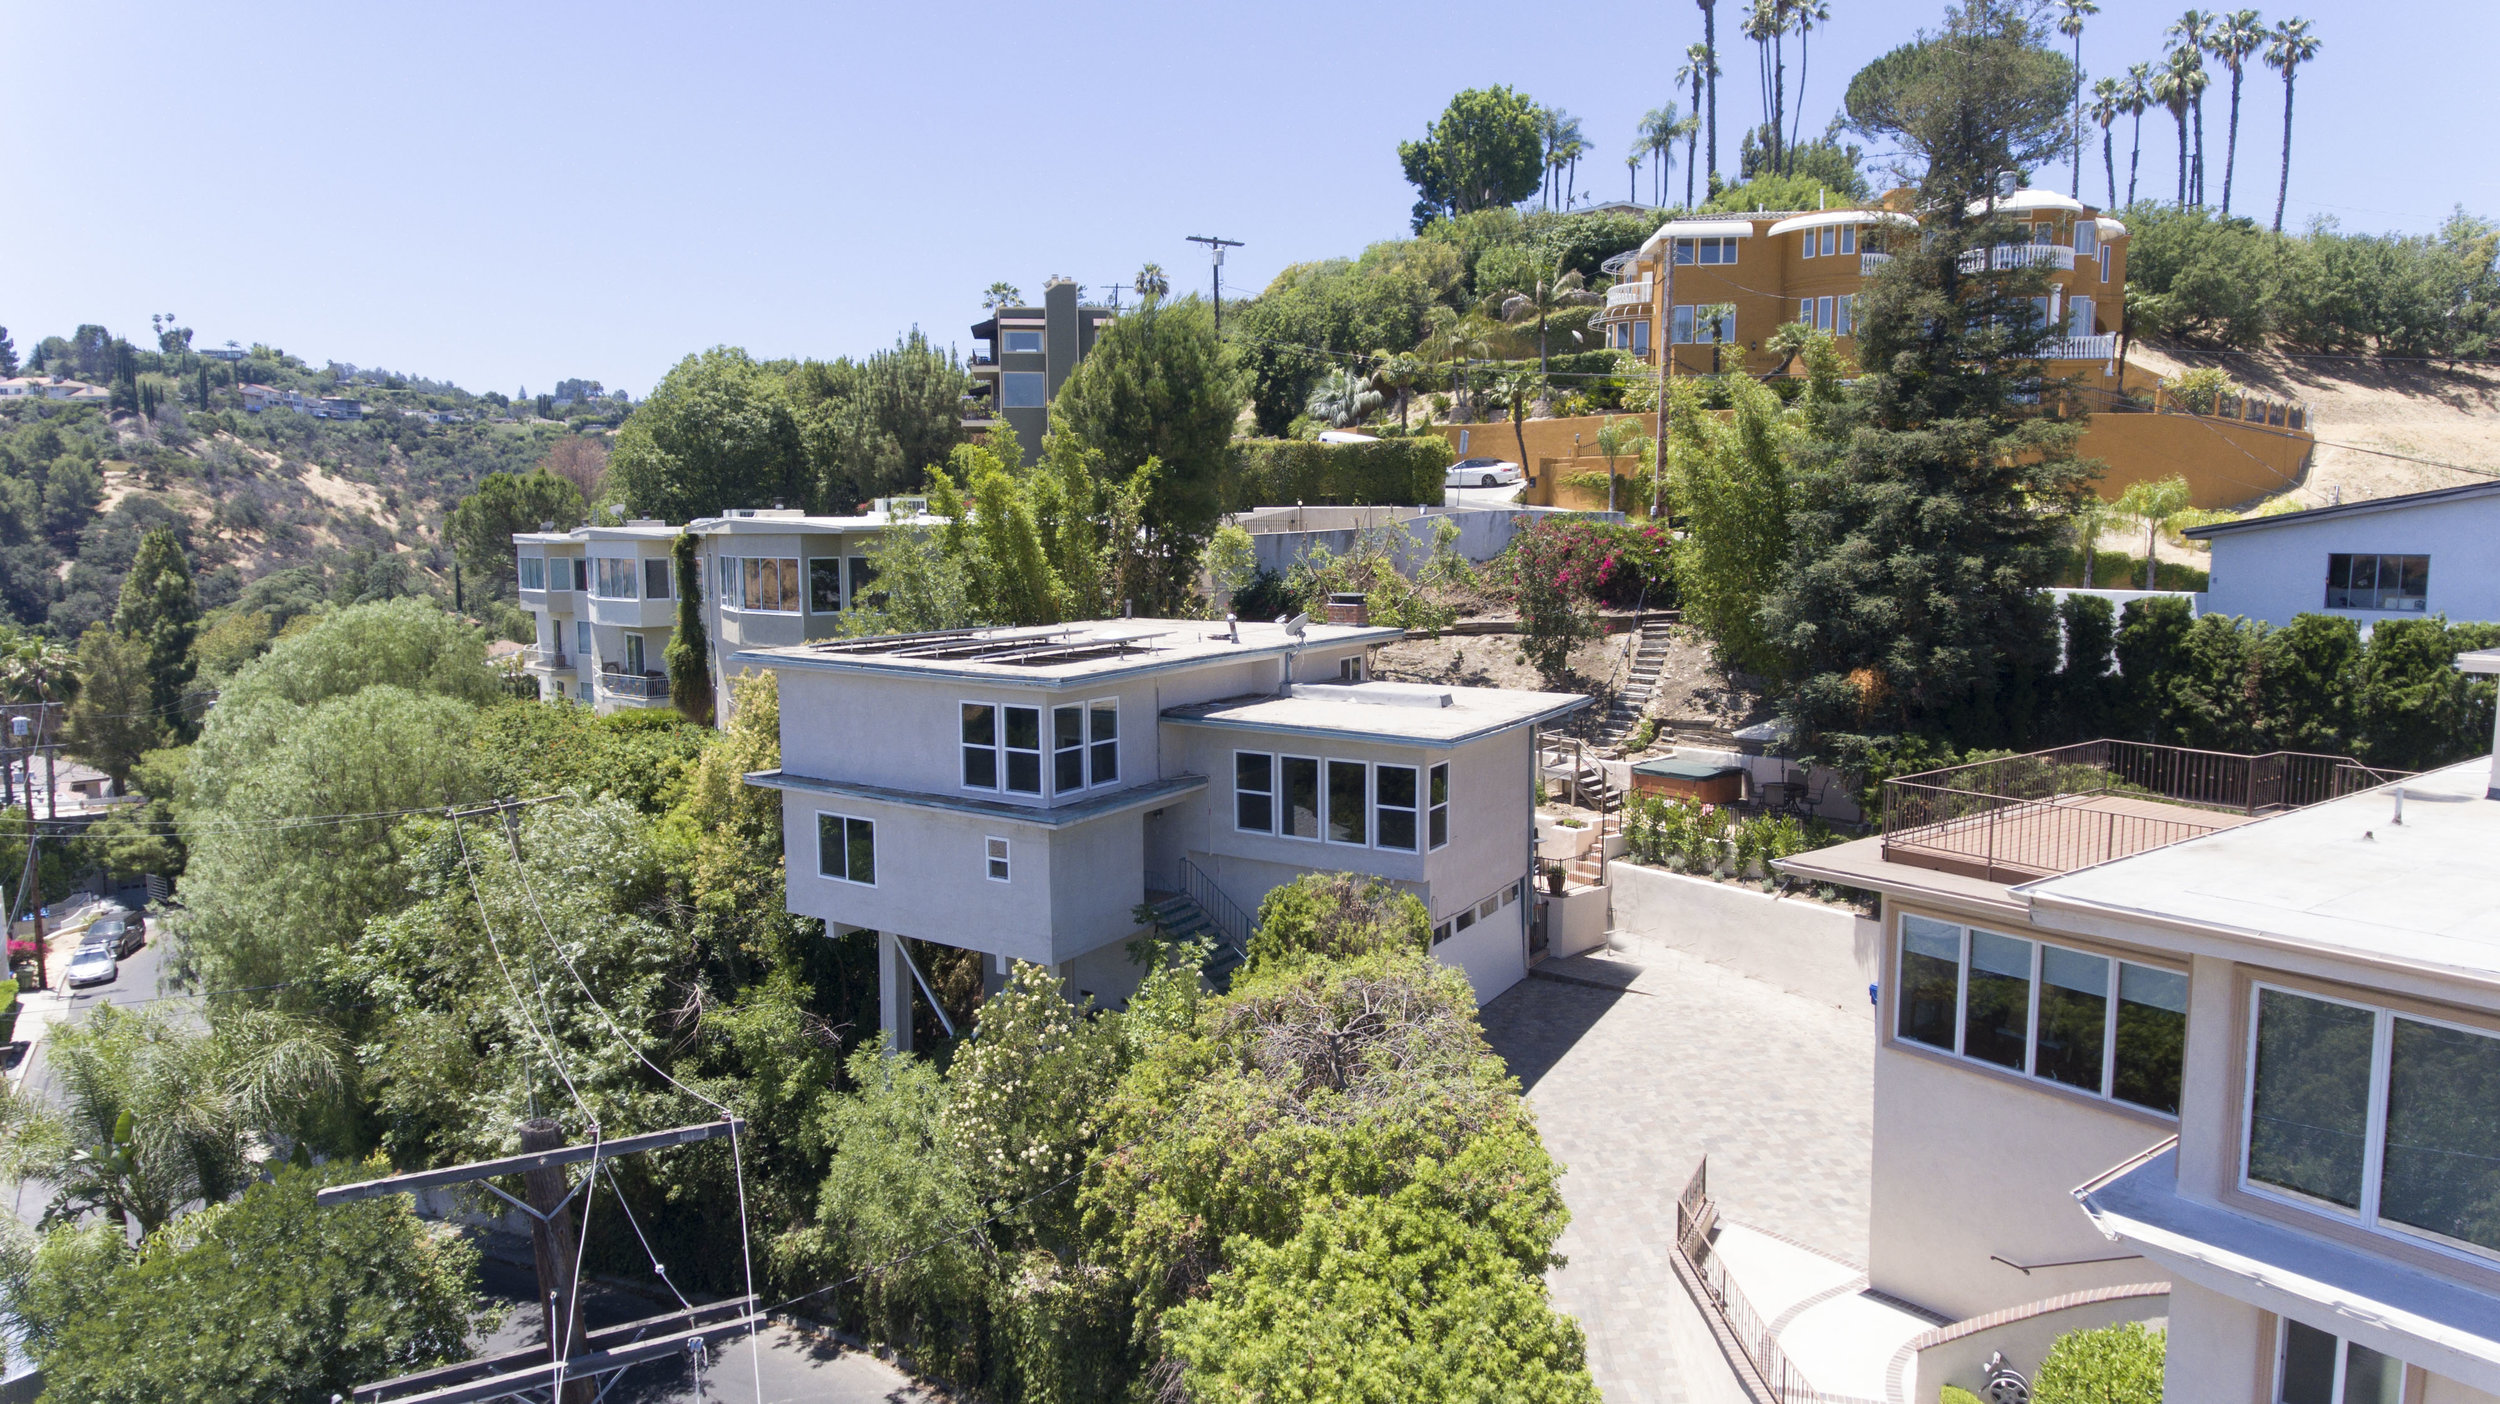 025 View 15072 Rayneta Sherman Oaks For Sale The Malibu Life Team Luxury Real Estate.jpg